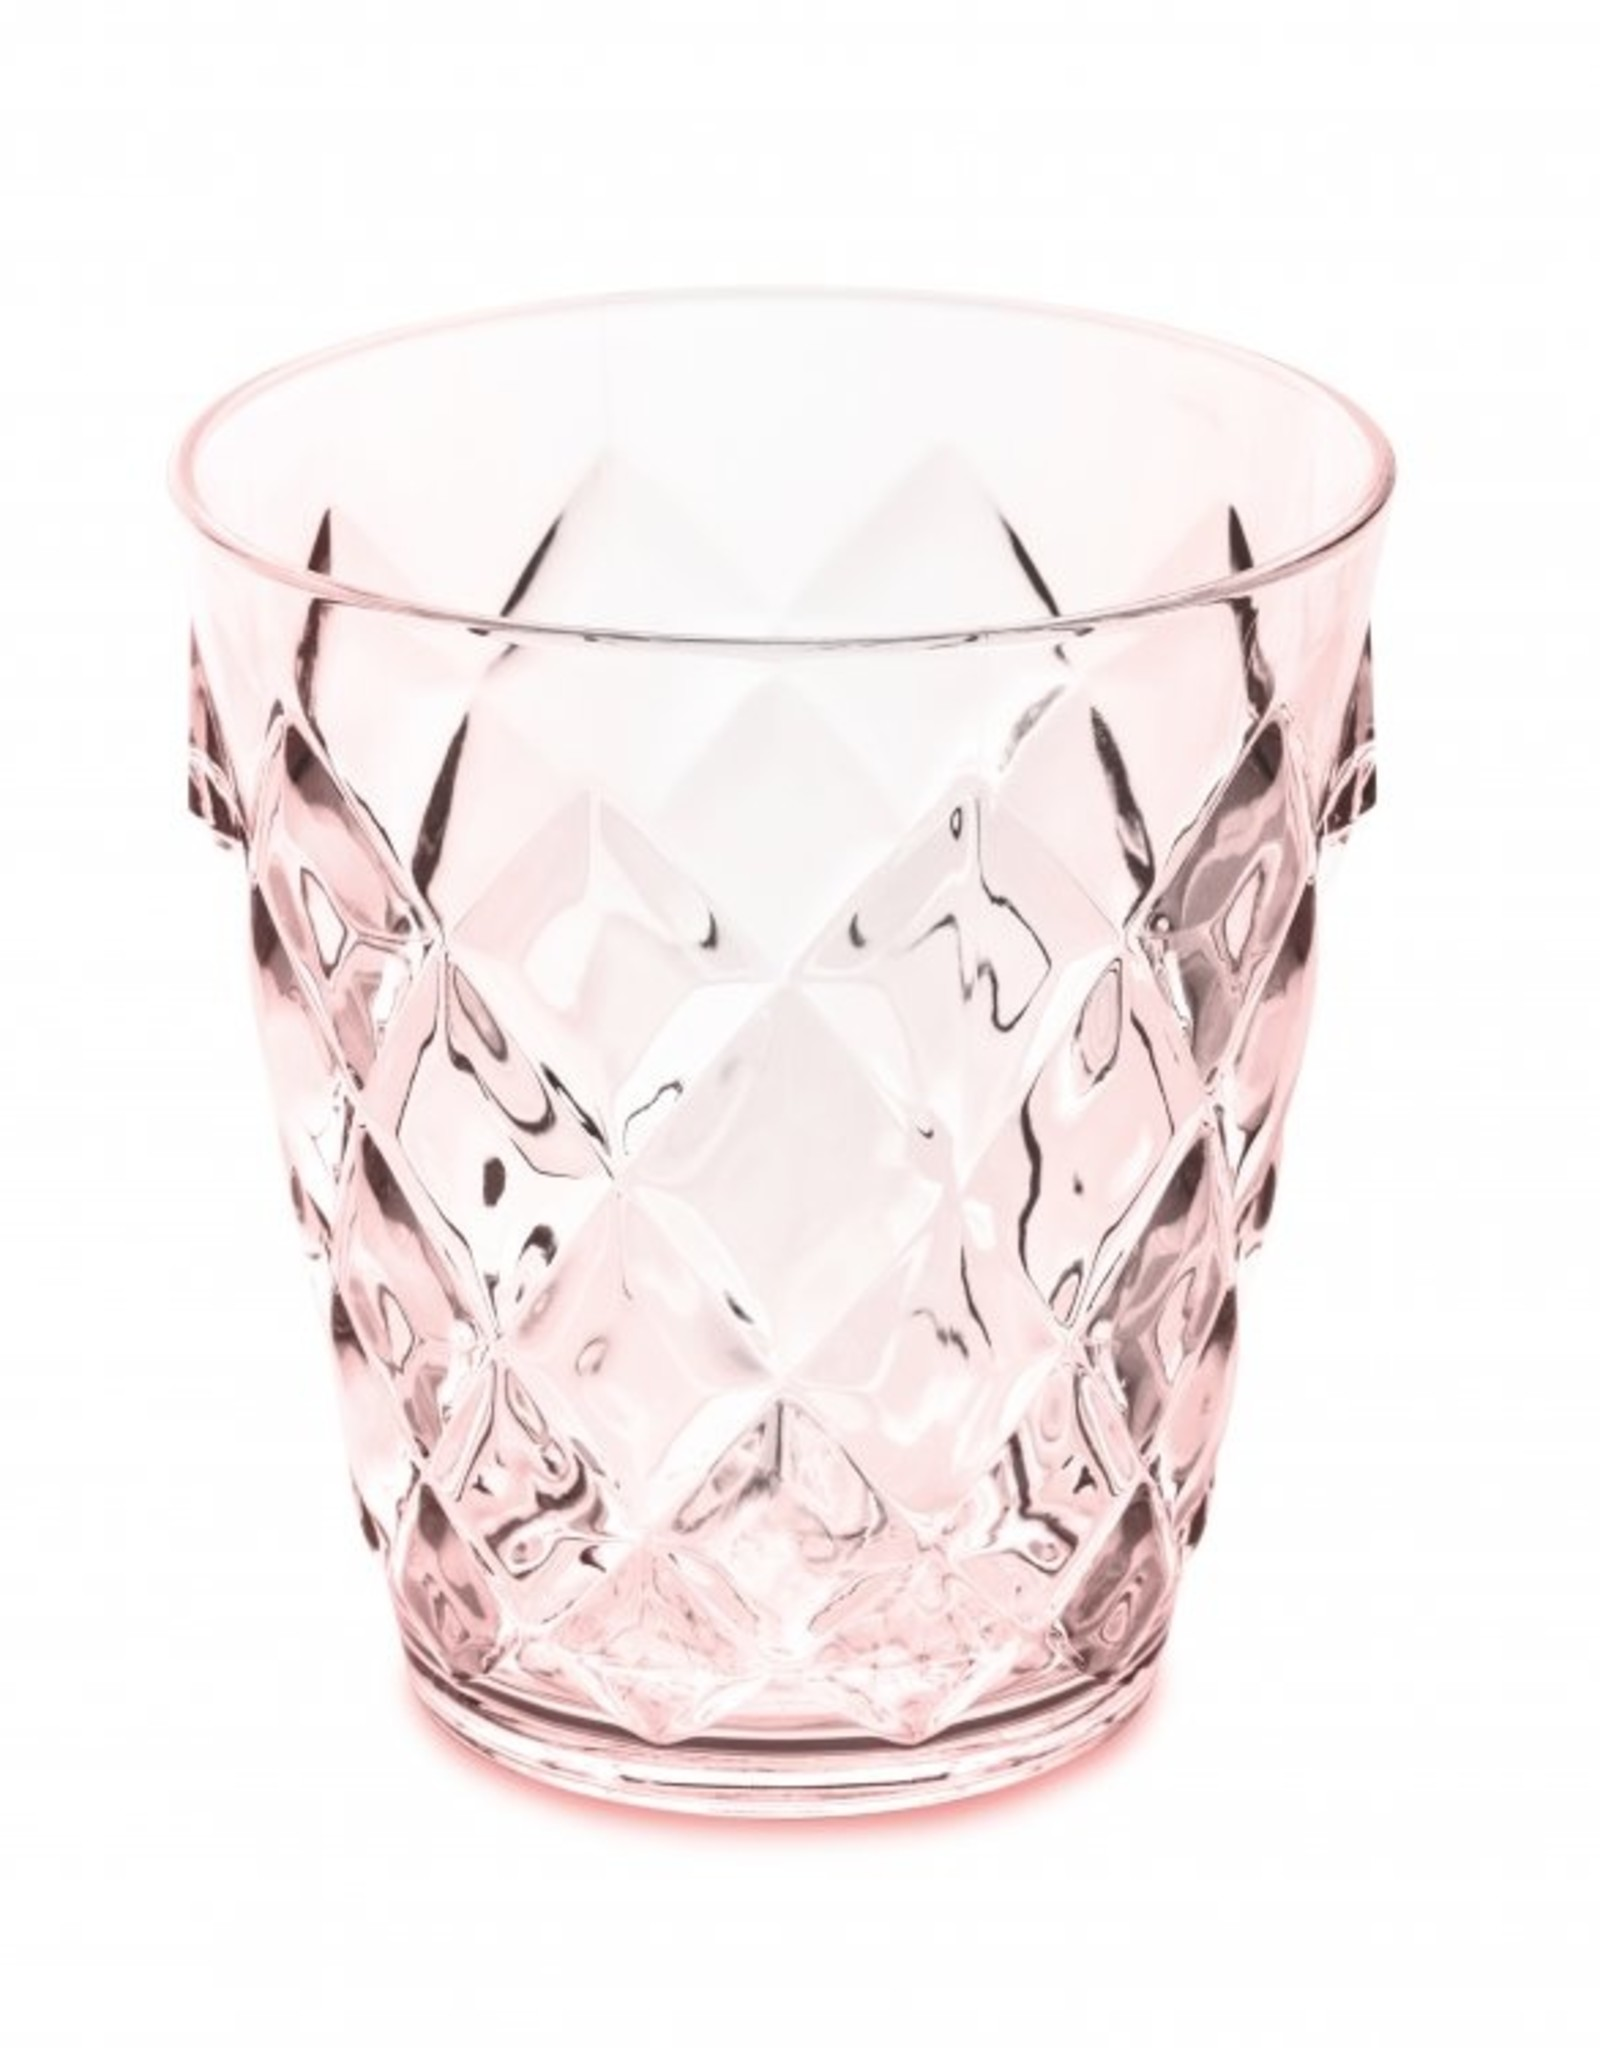 Koziol Koziol - Crystal S - Drinkglas - 250ml - transparant roze - set van 8